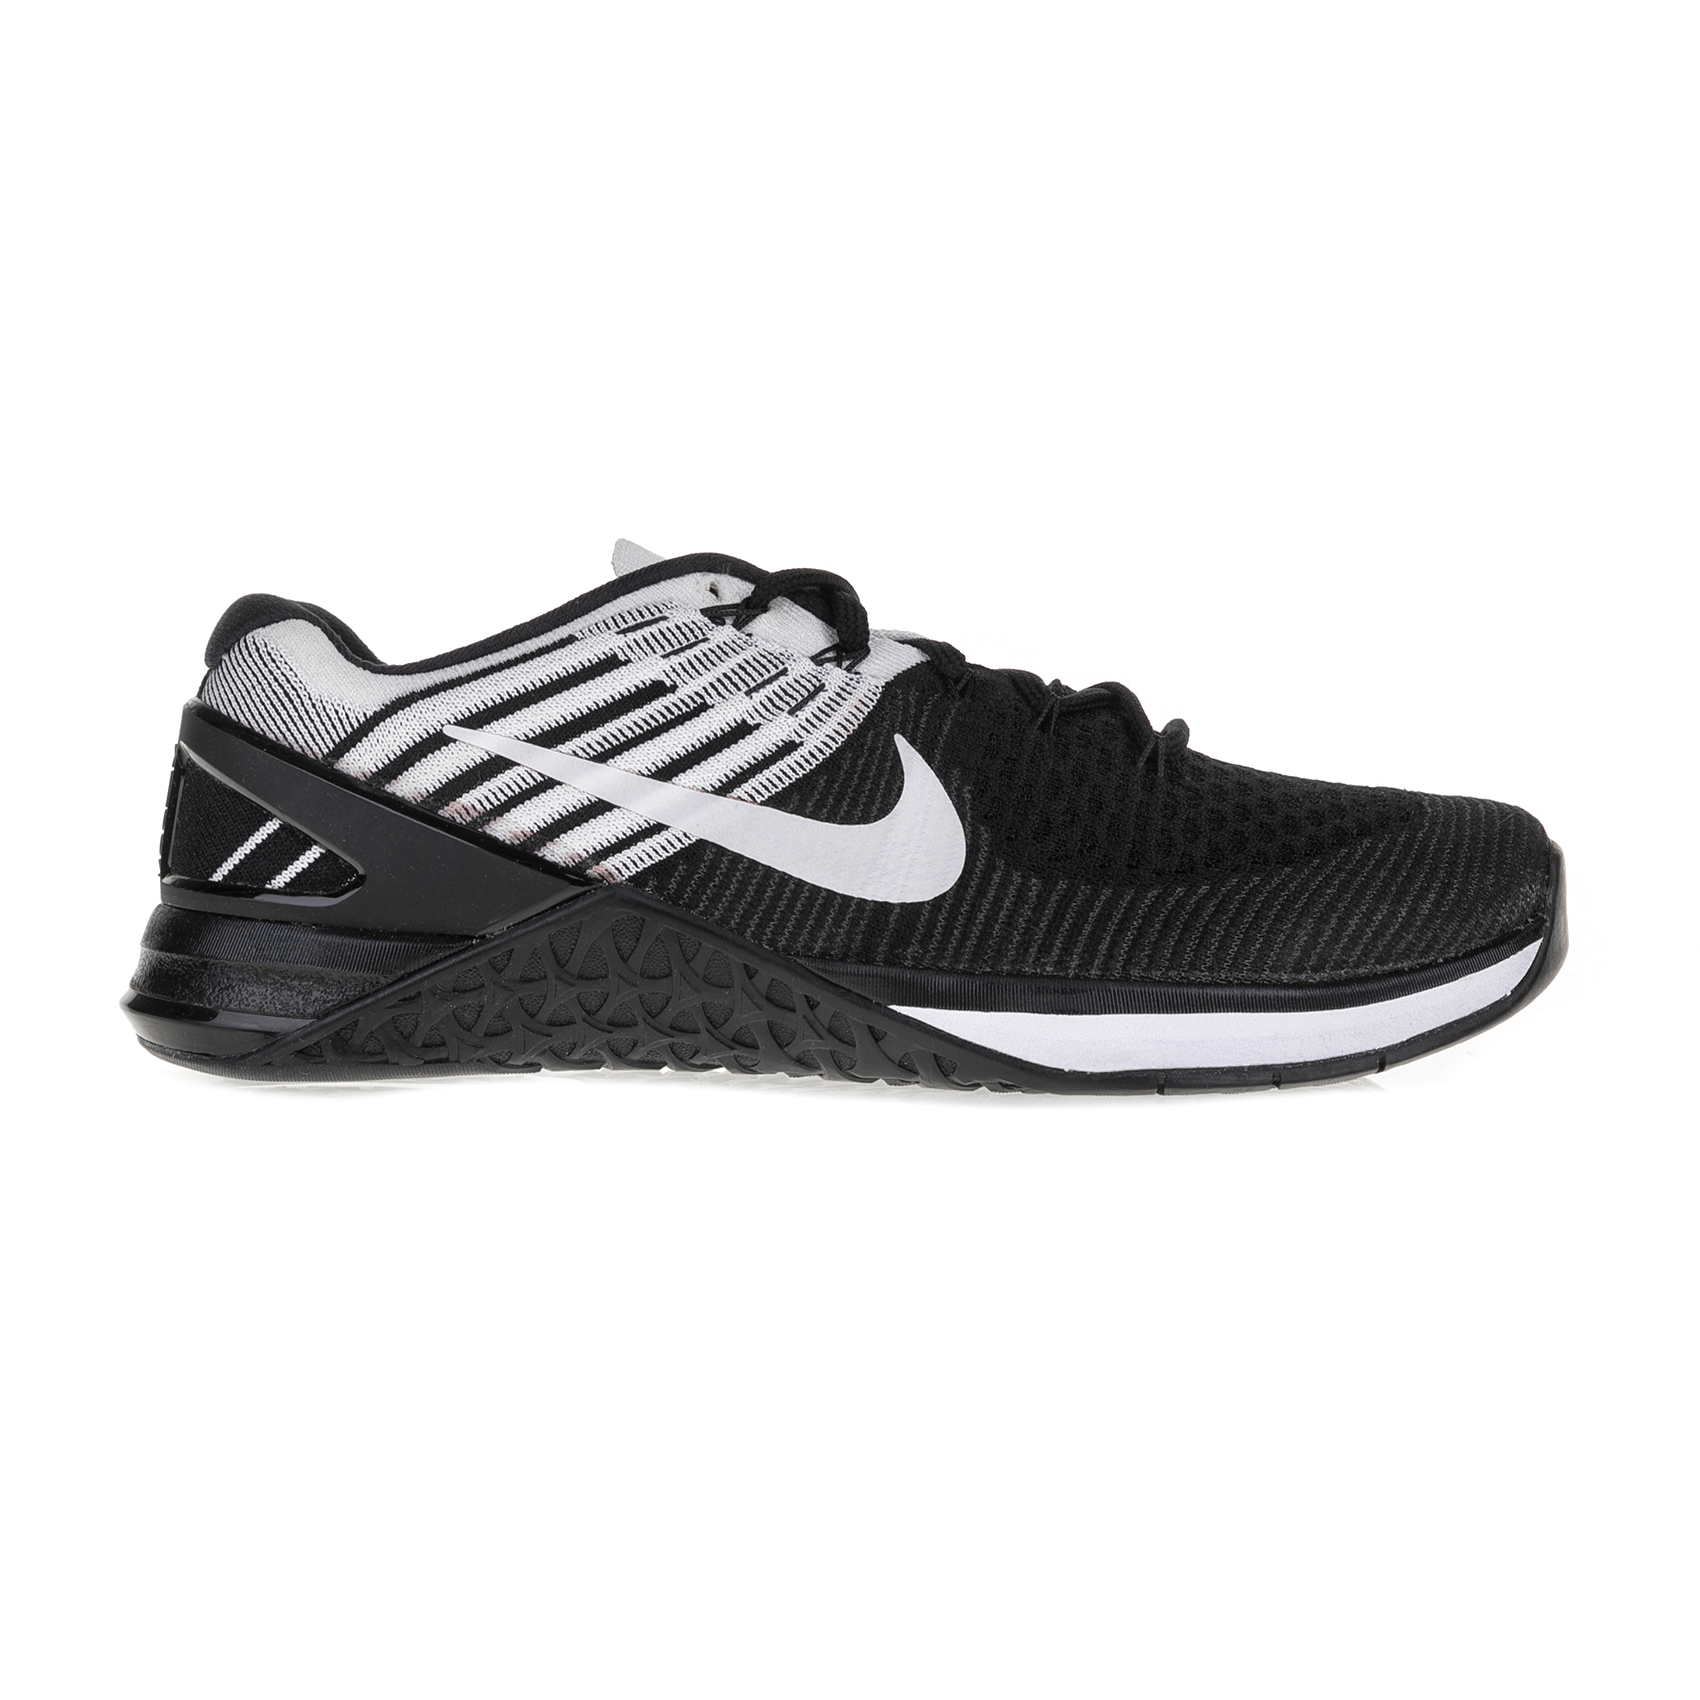 NIKE – Γυναικεία αθλητικά παπούτσια Nike METCON DSX μαύρα – λευκά